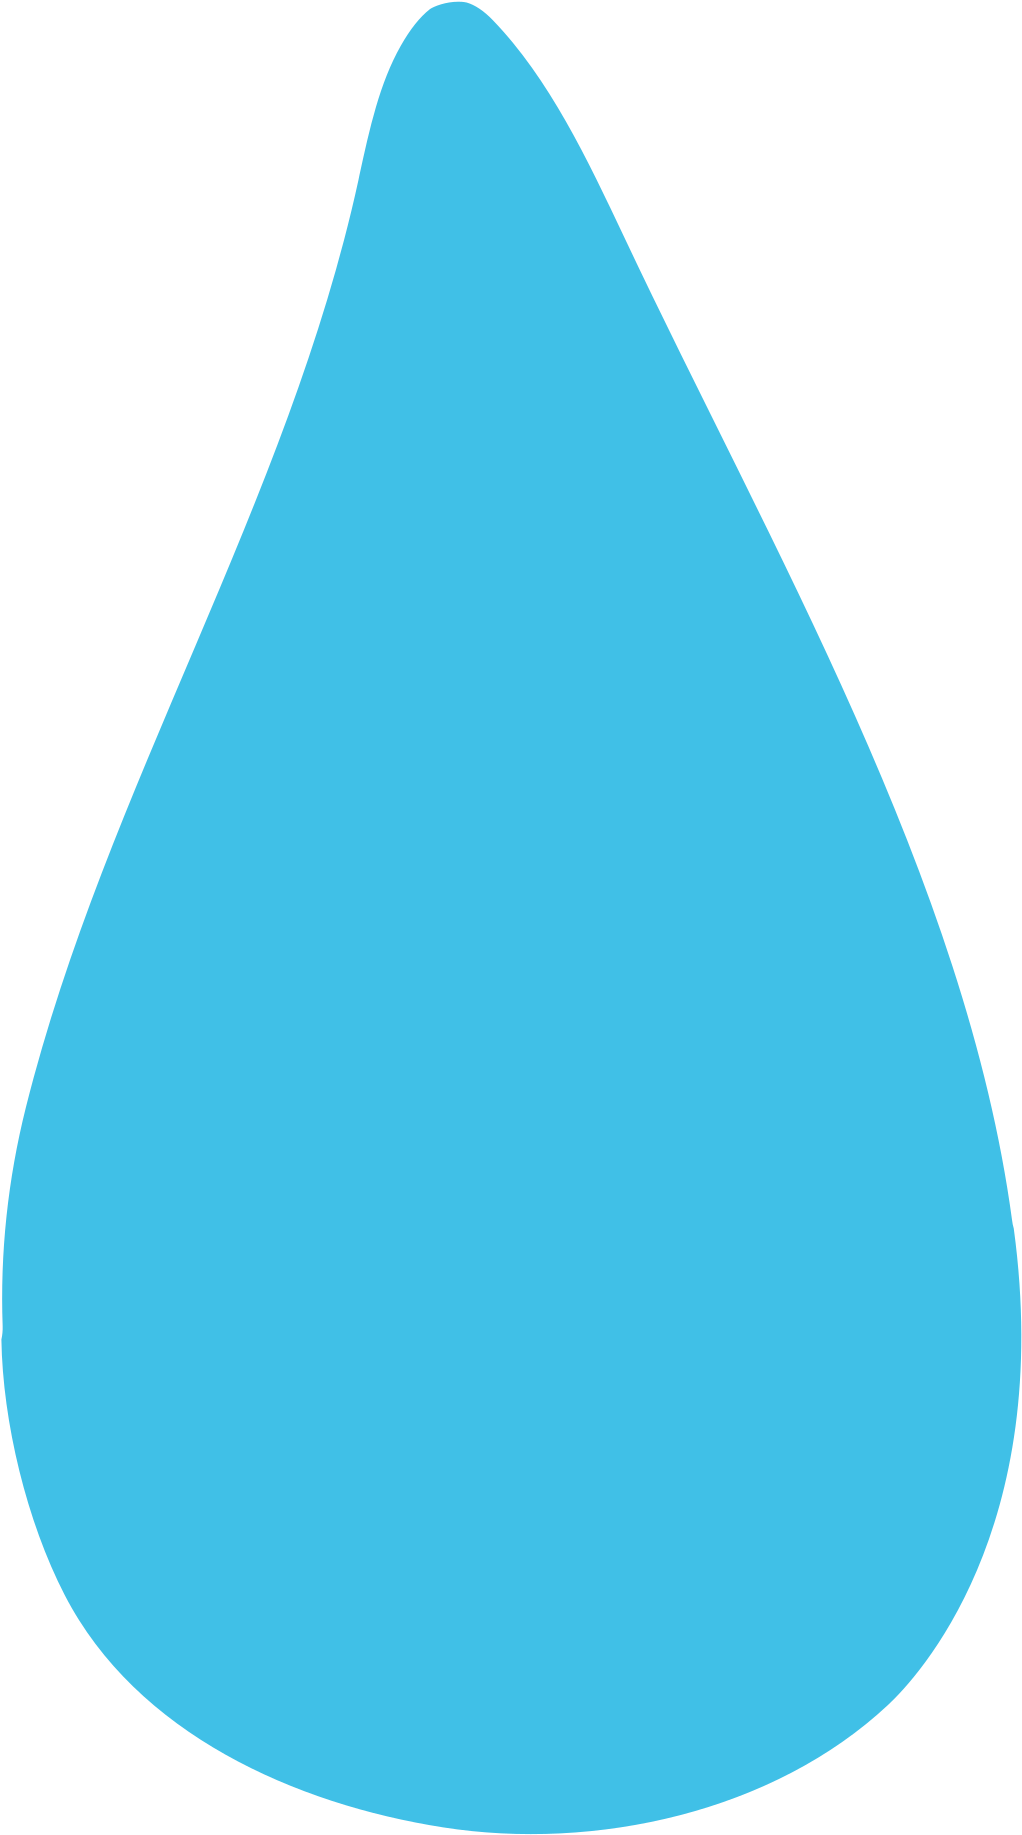 Download Svg Black And White File Emoji U F A Svg Wikimedia Emoji Sweat Drop Full Size Png Image Pngkit